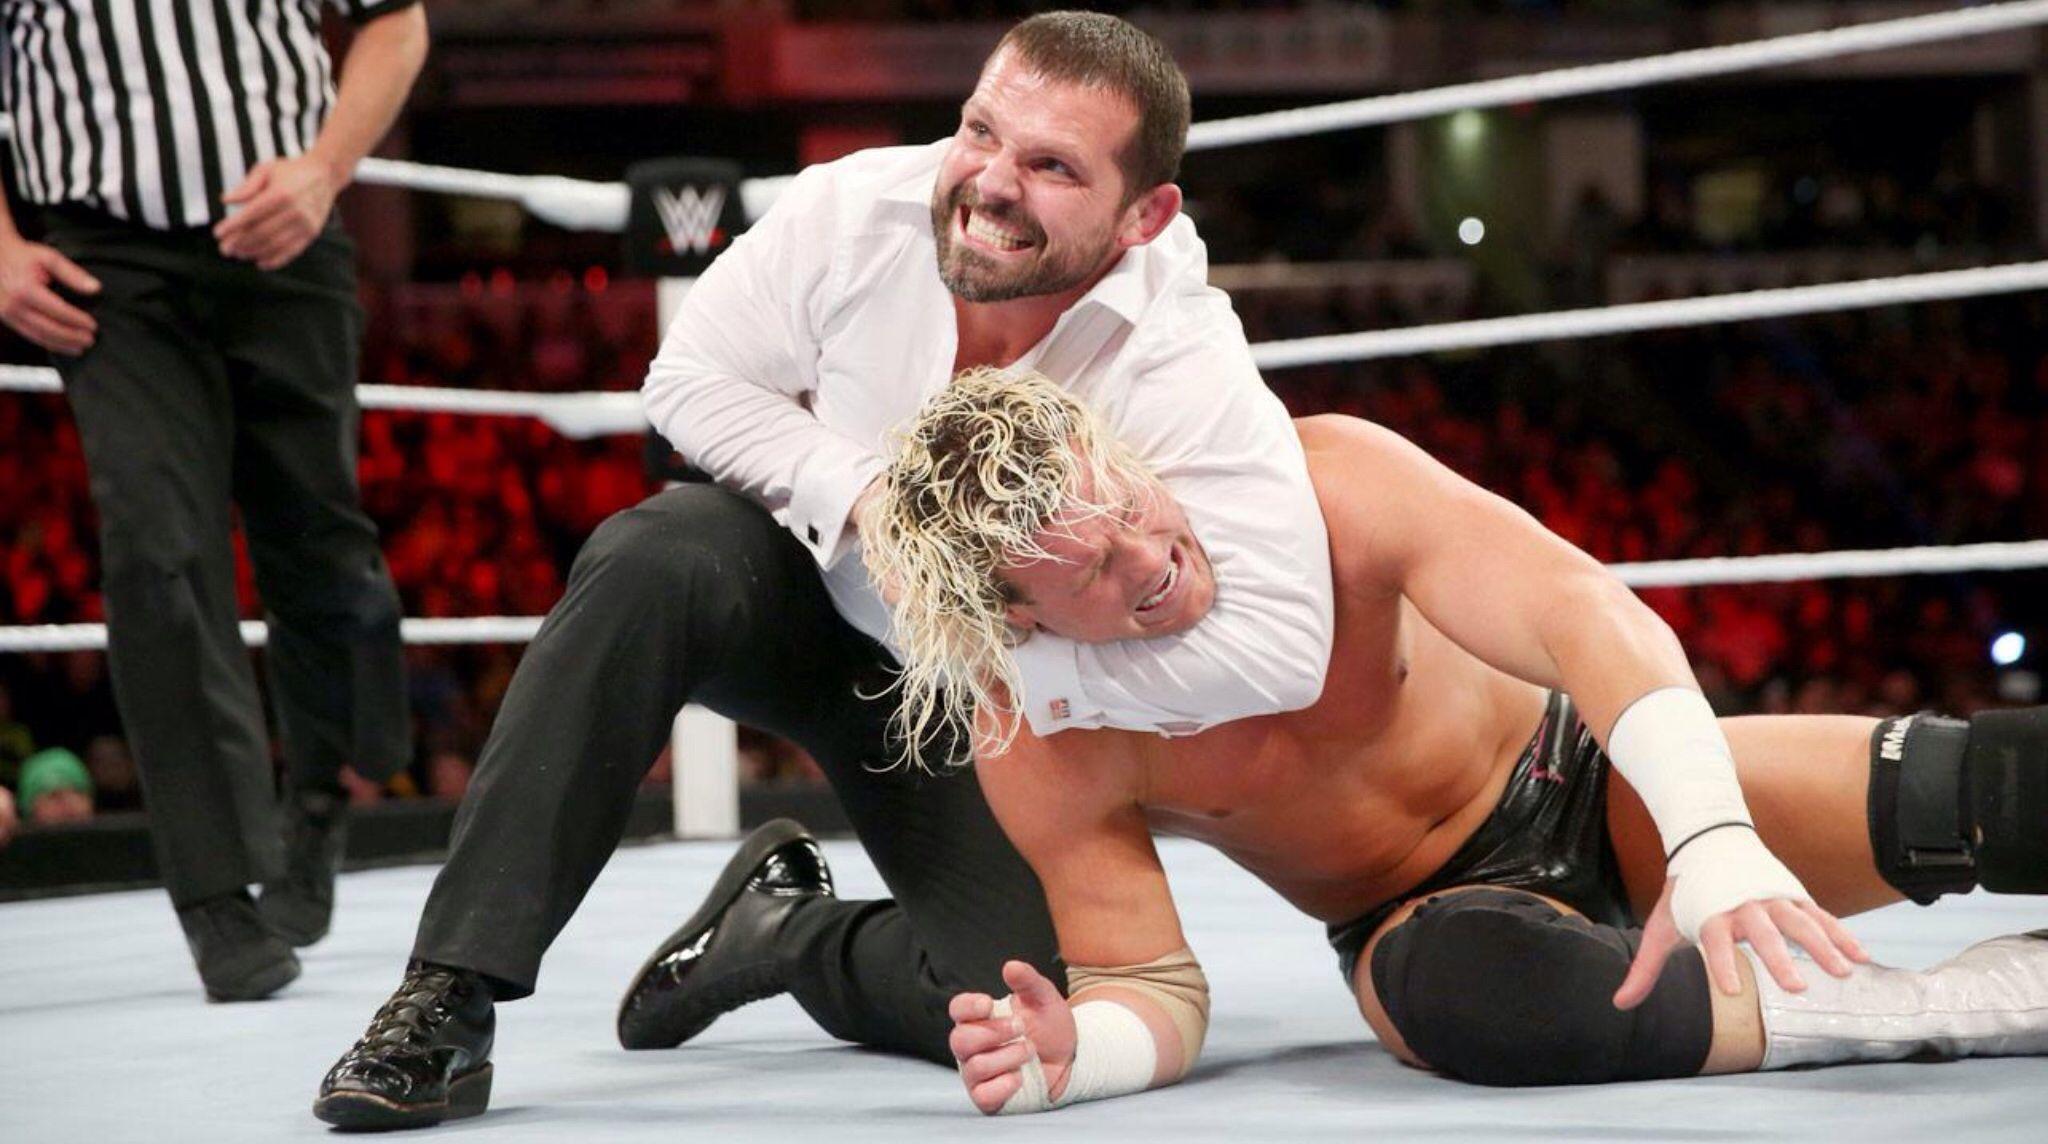 WWE John Cena & Dolph Ziggler vs Mr Money in the Bank Seth Rollins, Jamie Noble & Joey Mercury, 3-on-2 Handicap Match